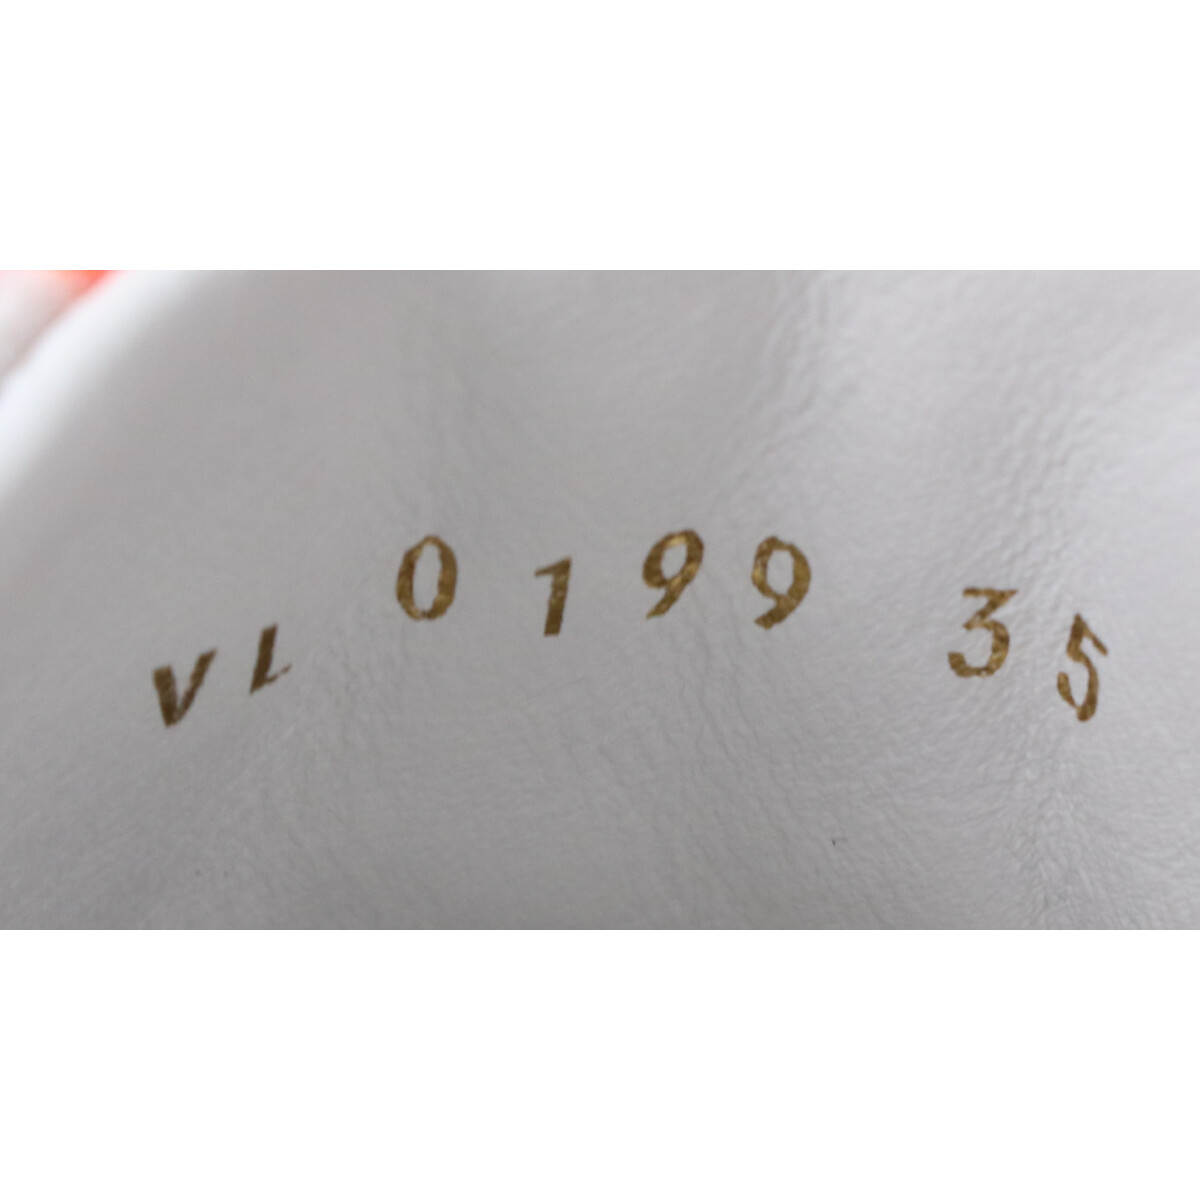 LOUIS VUITTON ルイ・ヴィトン 19年製 1A65Z5 ステラー・ライン スニーカー 35 オランジュ レディースJ1cKlTF